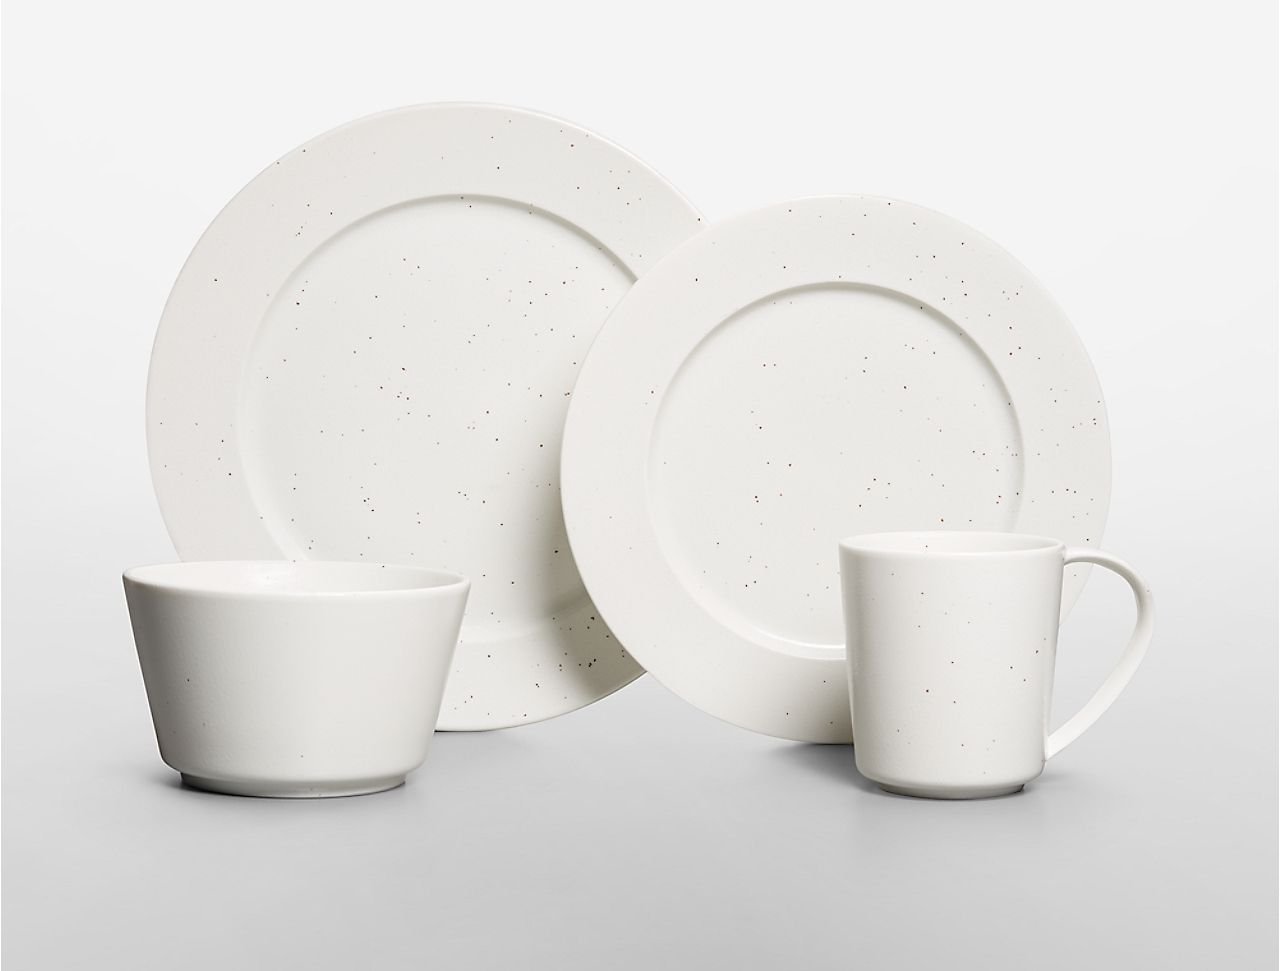 georgica dinnerware in dover | Calvin Klein & georgica dinnerware in dover | Calvin Klein | Ceramics | Pinterest